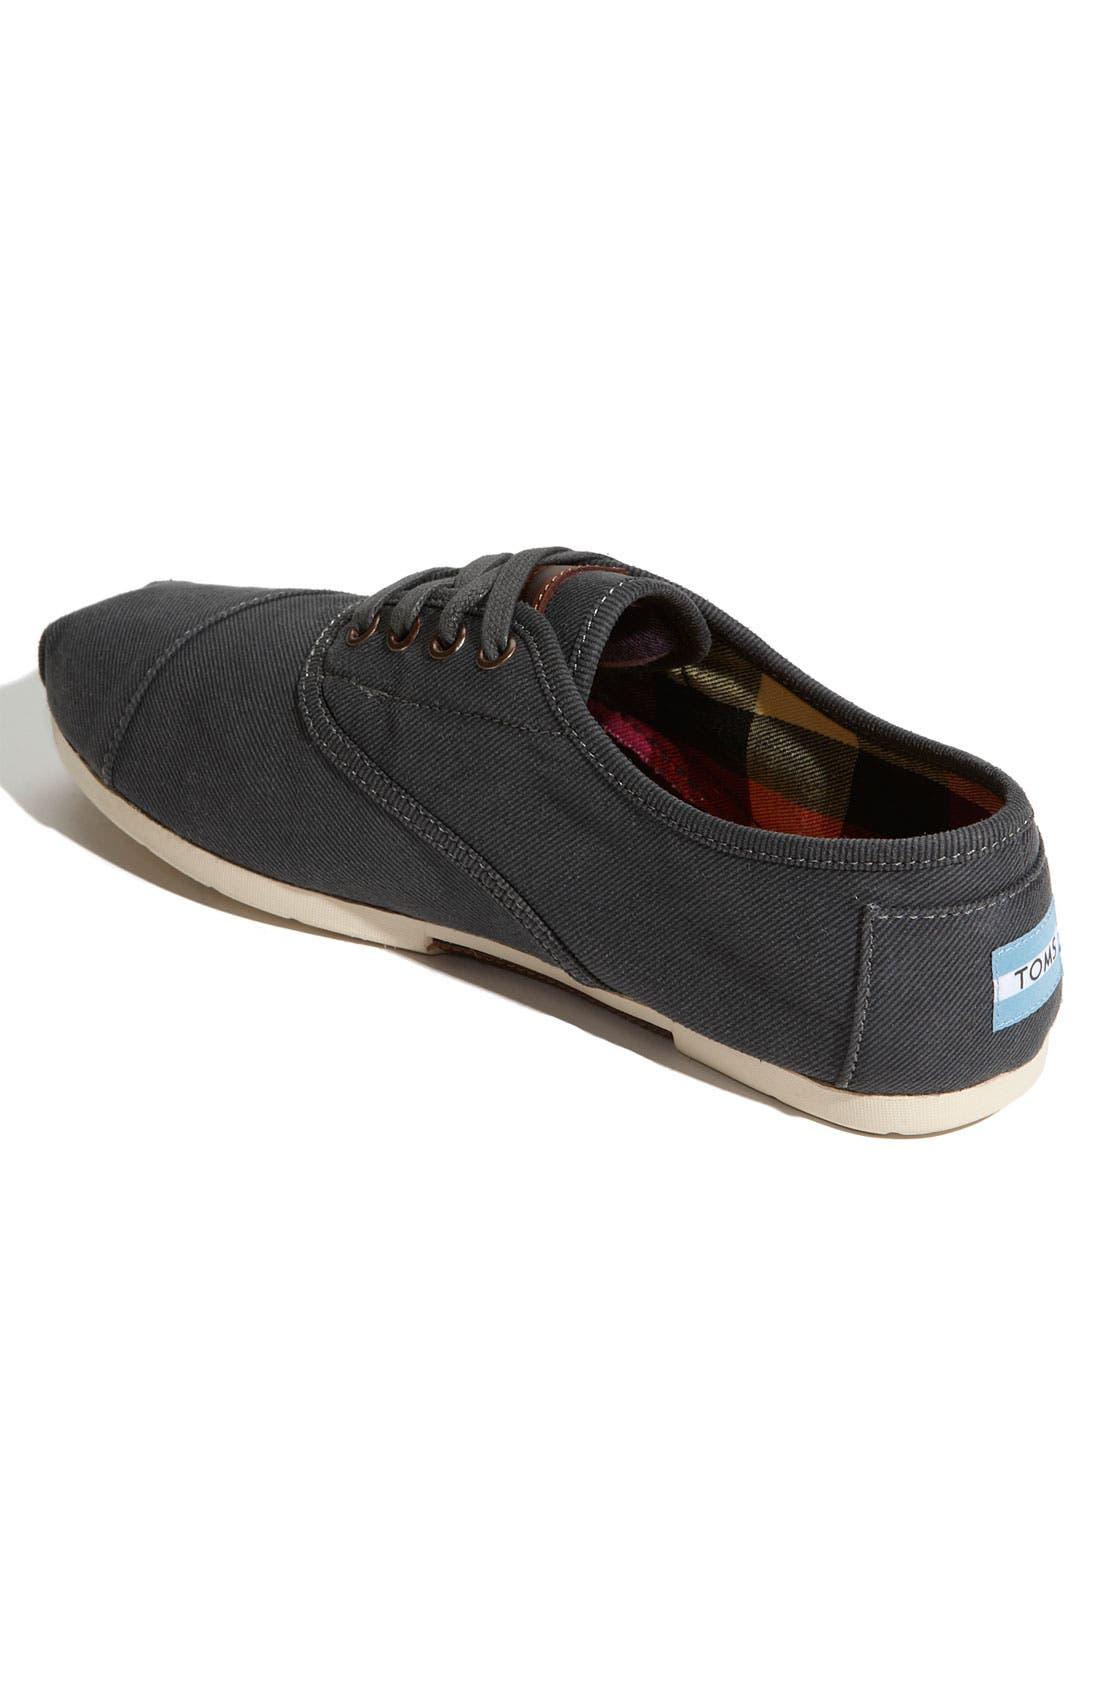 Alternate Image 2  - TOMS 'Cordones' Waxed Canvas Sneaker (Men)